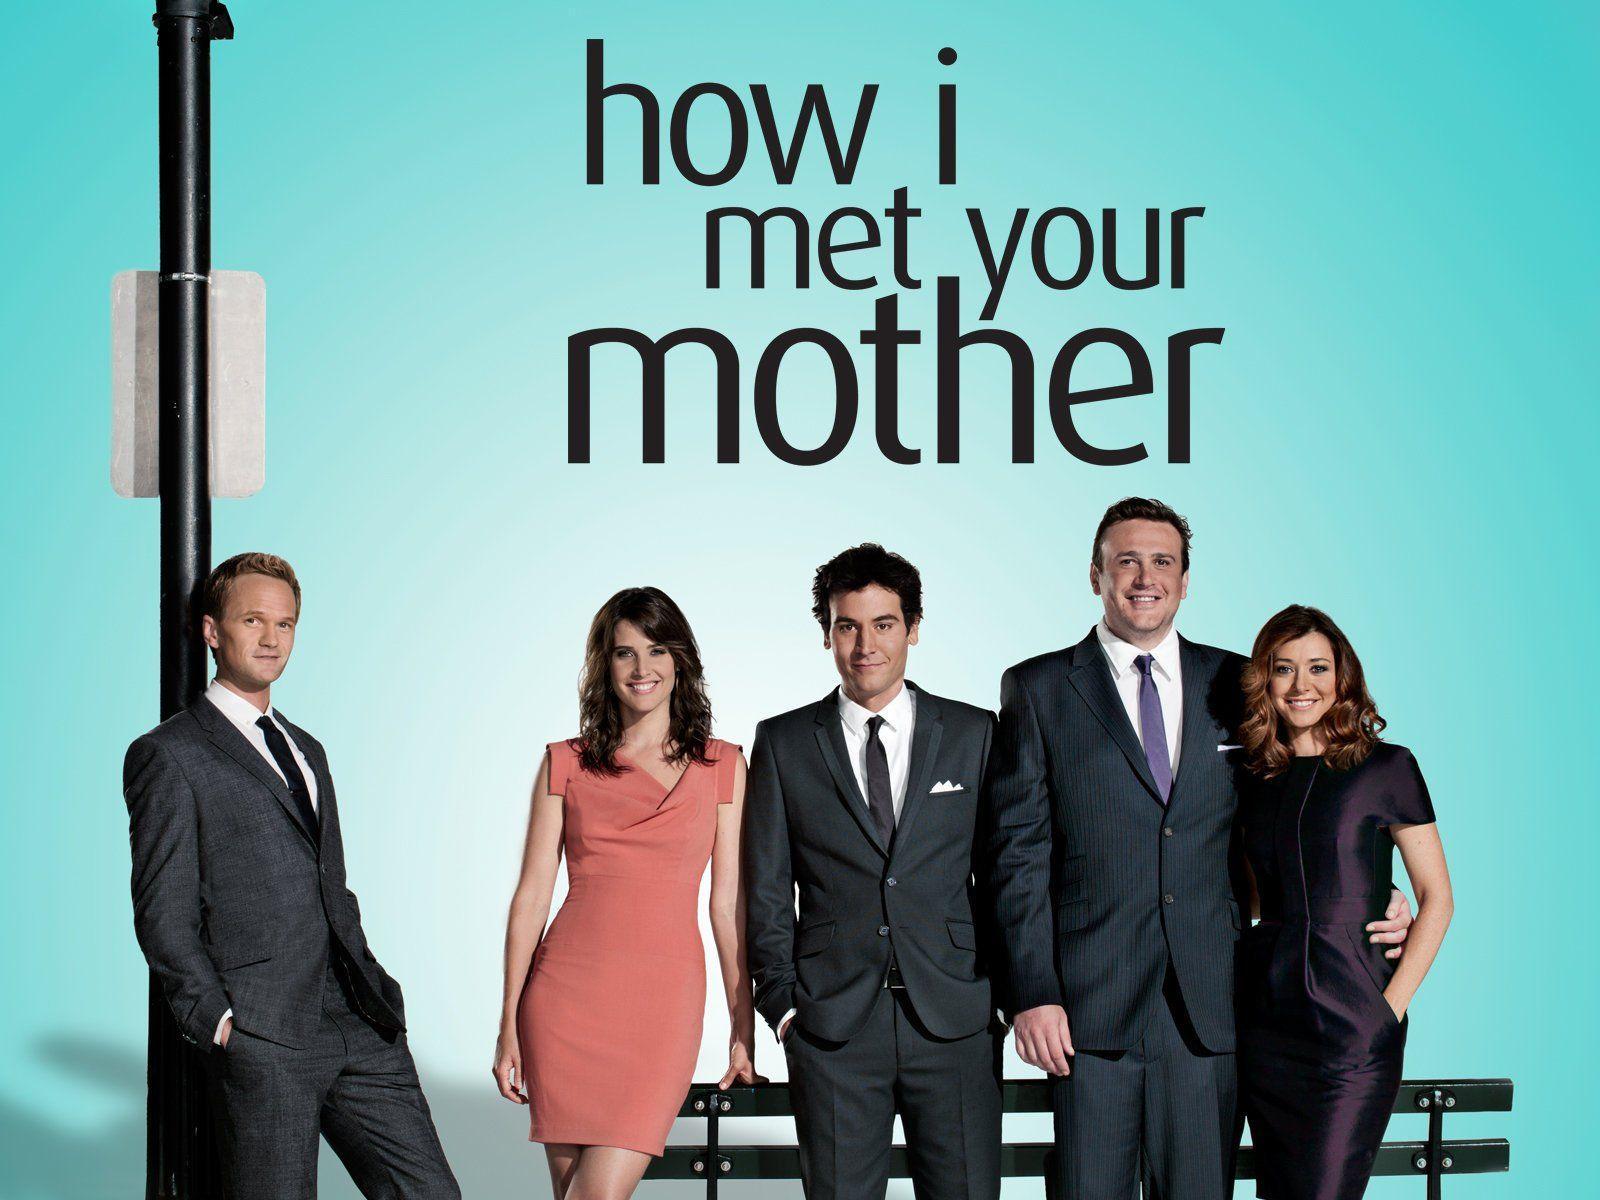 How I Met Your Mother Wallpapers Top Free How I Met Your Mother